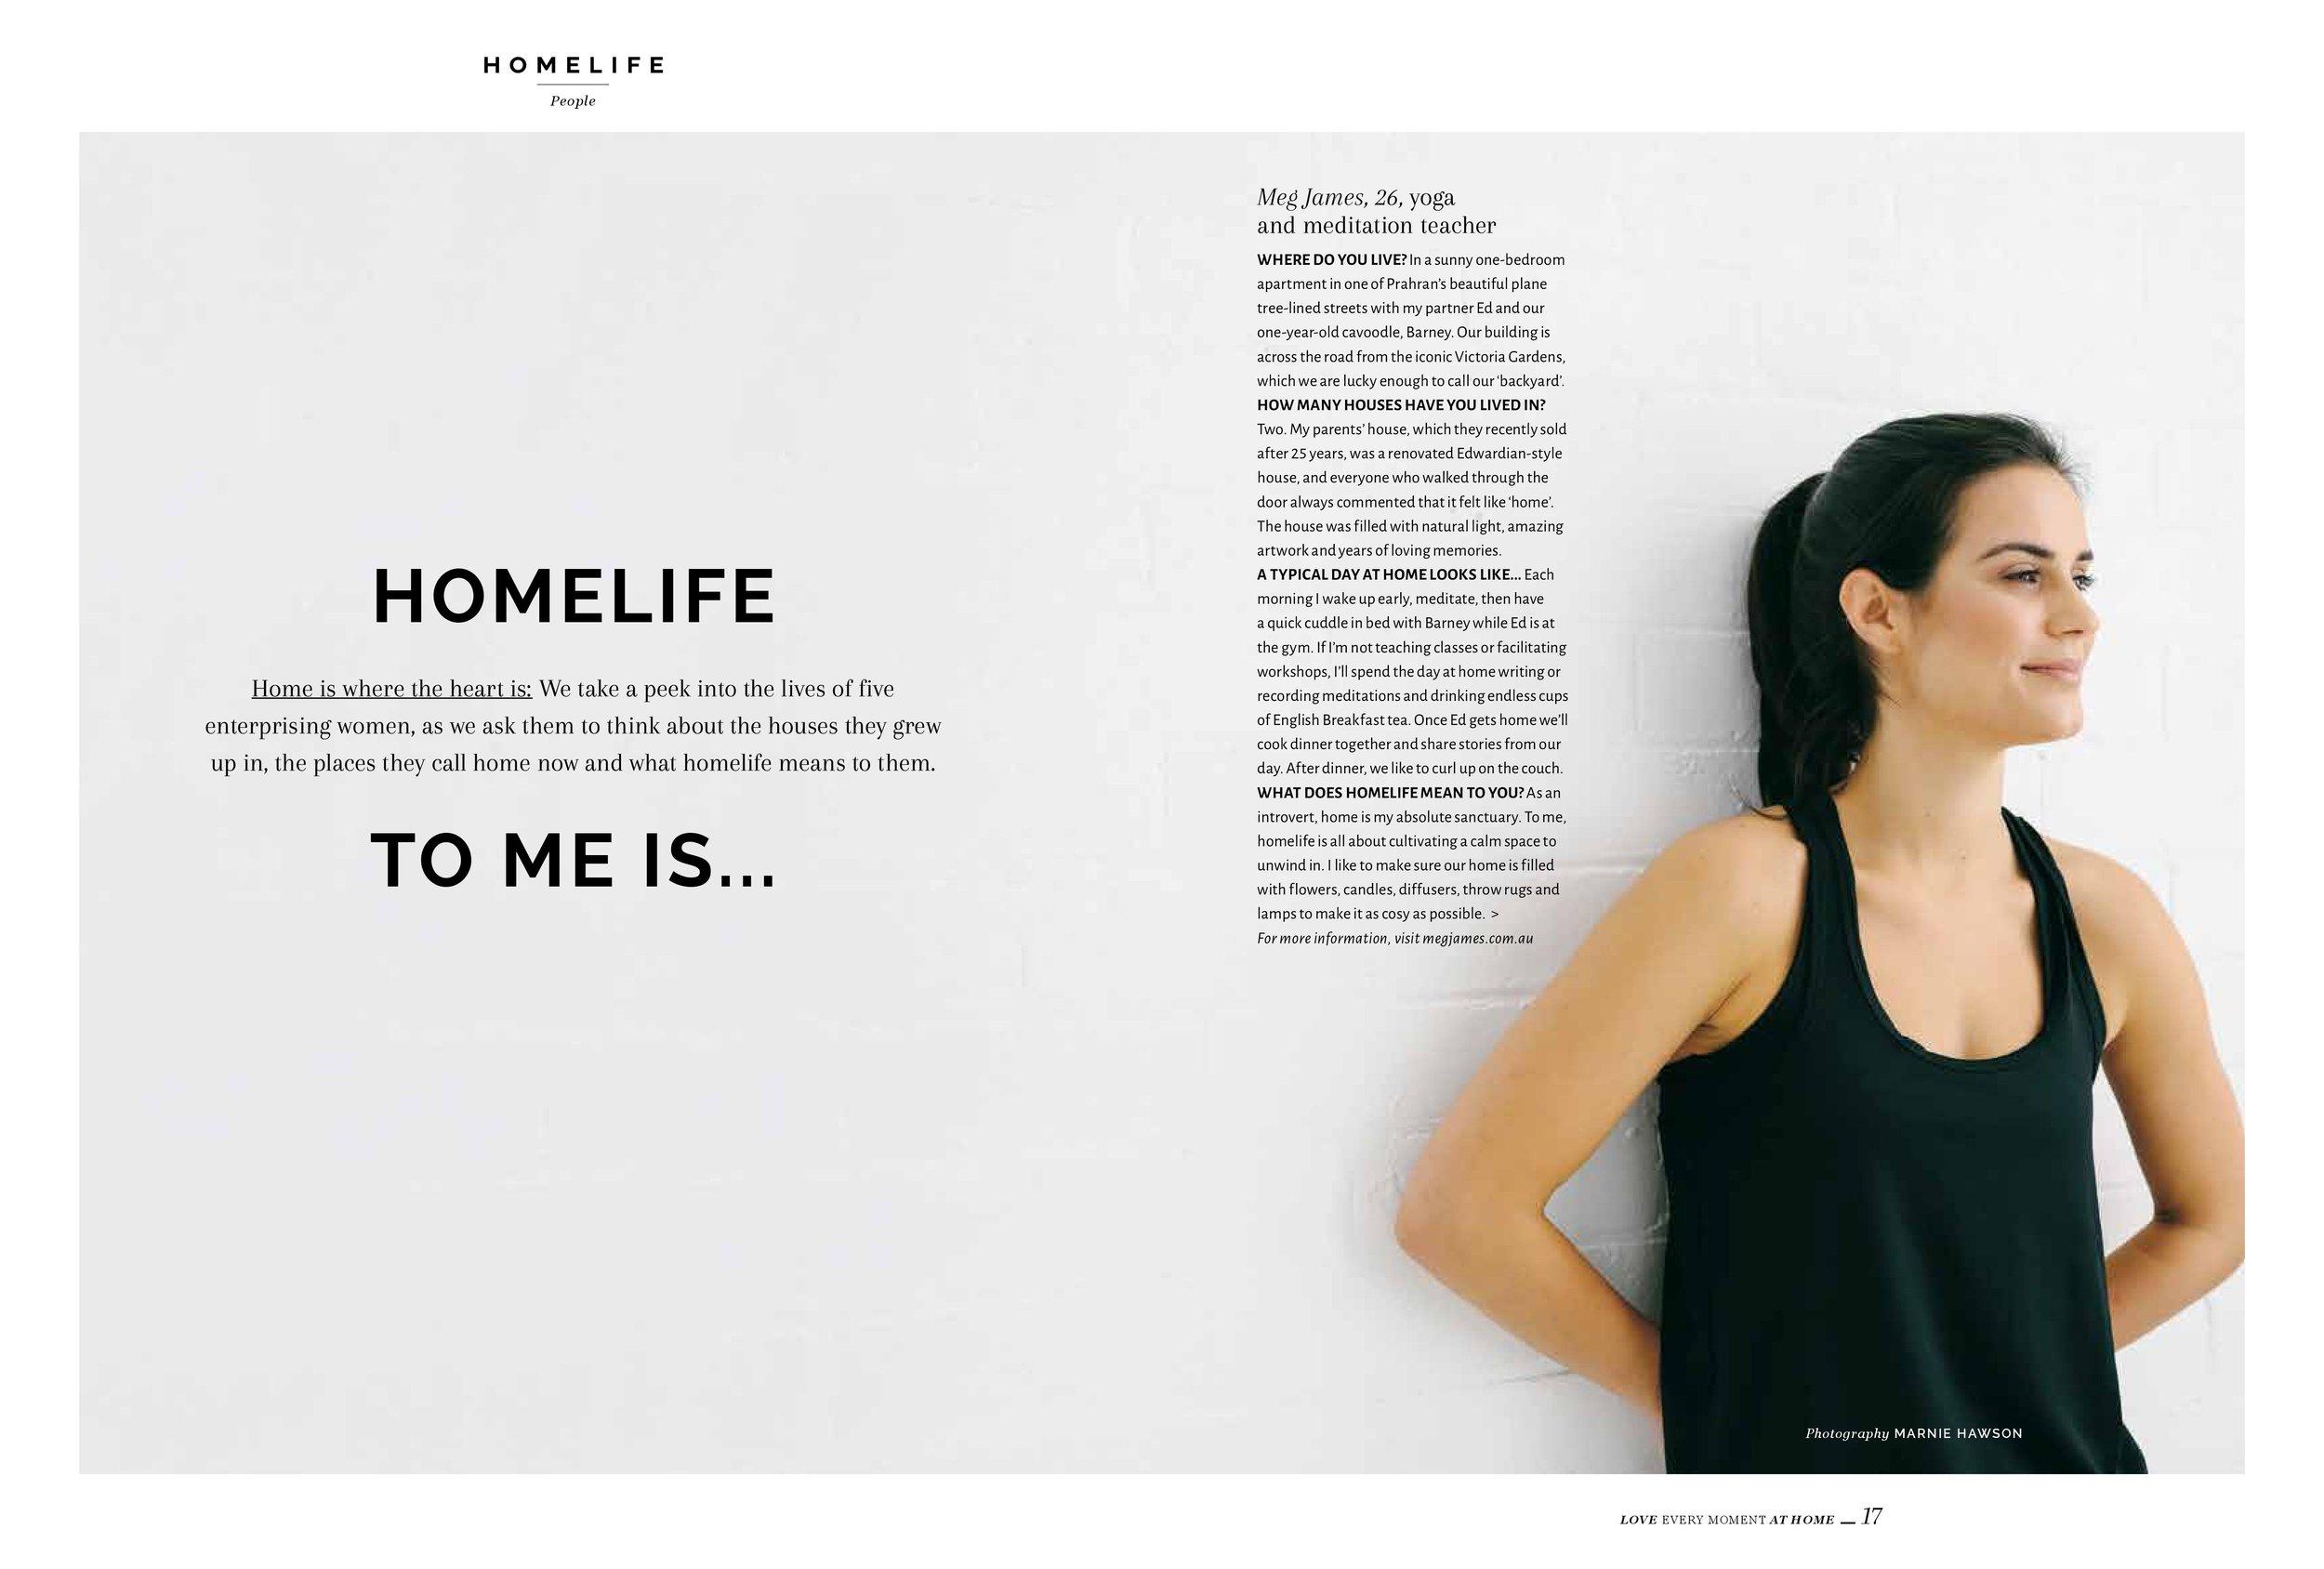 Marnie Hawson, Melbourne lifestyle photographer for Homelife magazine and Meg James